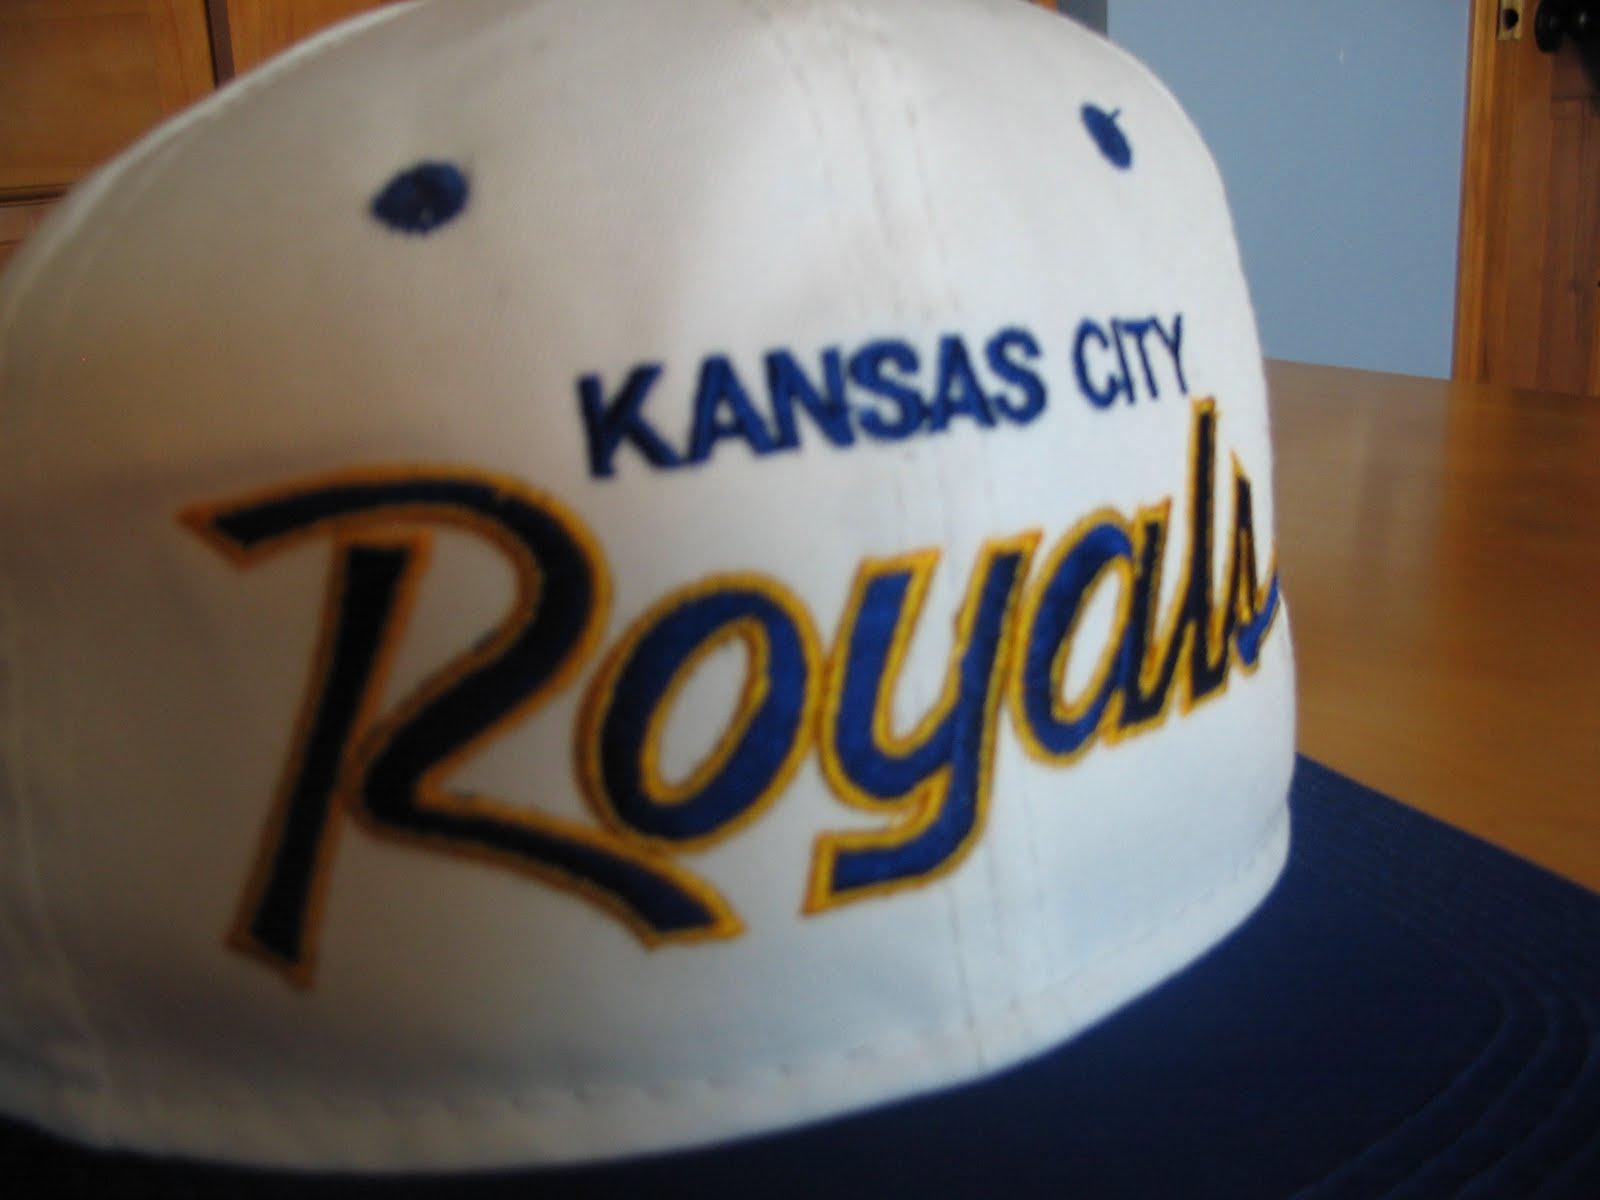 e4ace0b106a09 denmark new era kansas city royals mens blue vintage 59fifty fitted hat  e1296 f0c91  switzerland kansas city royals snapback. 65d77 b38b4